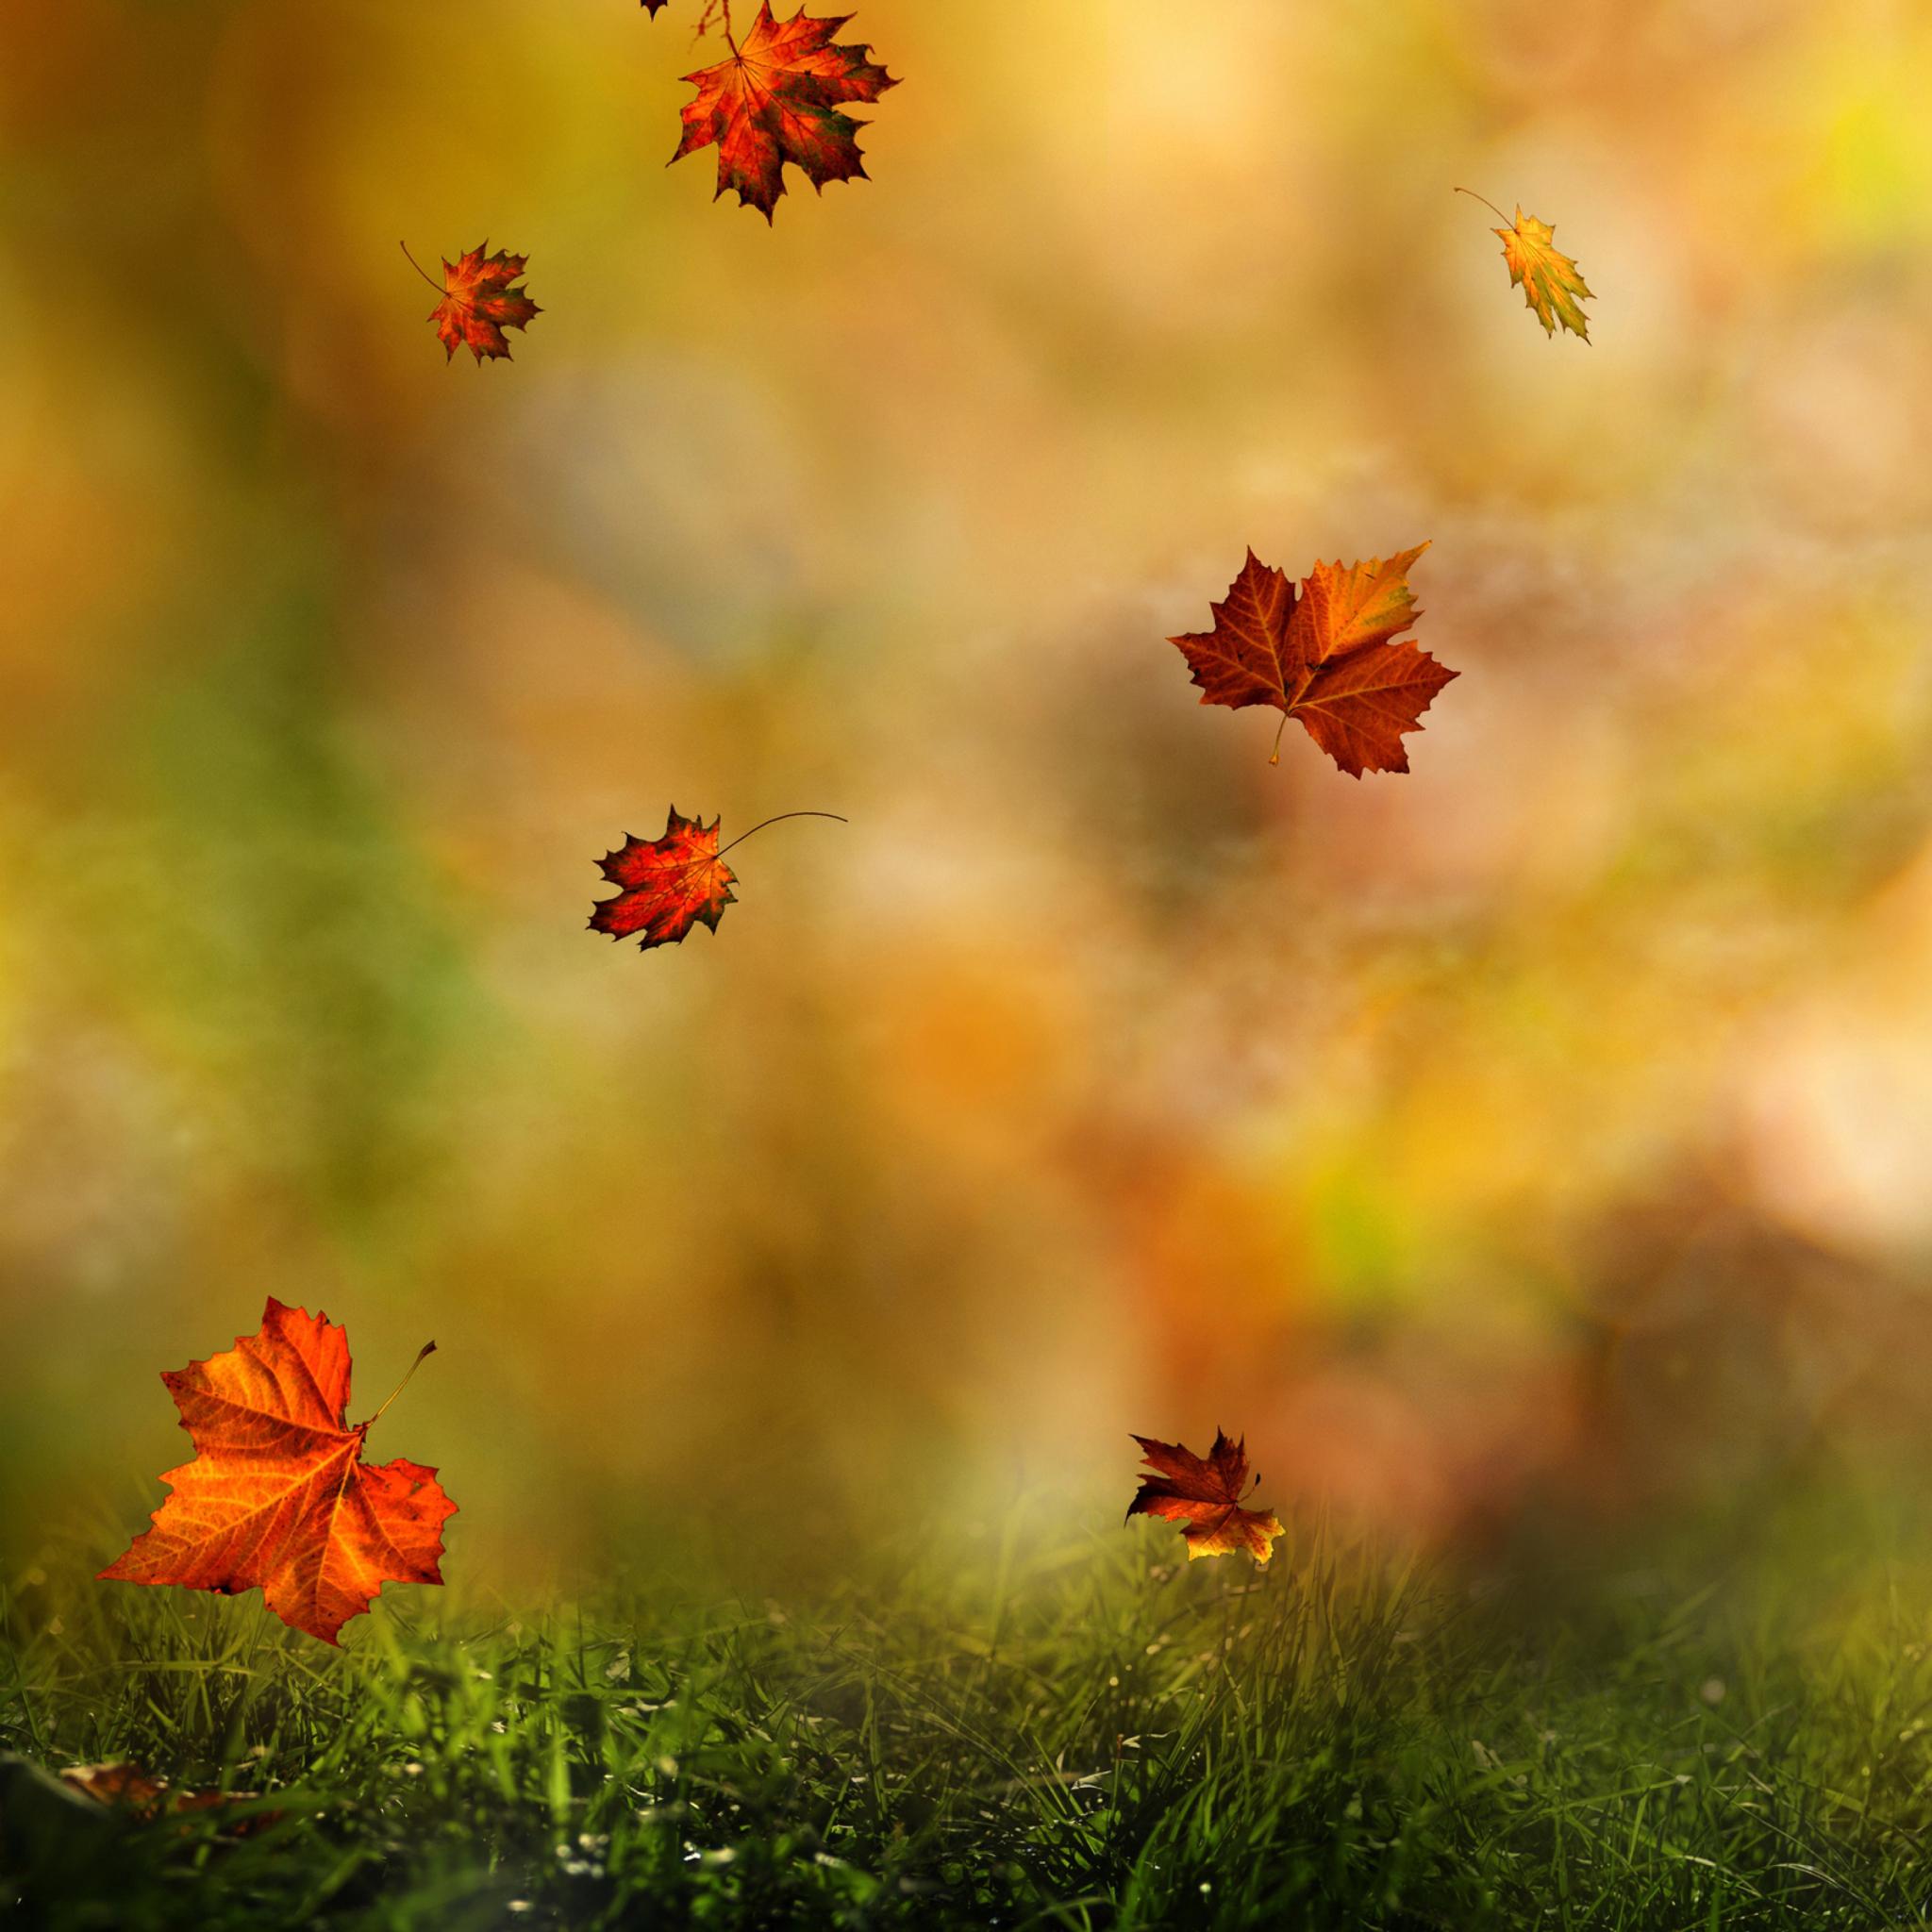 Осень картинки на телефон